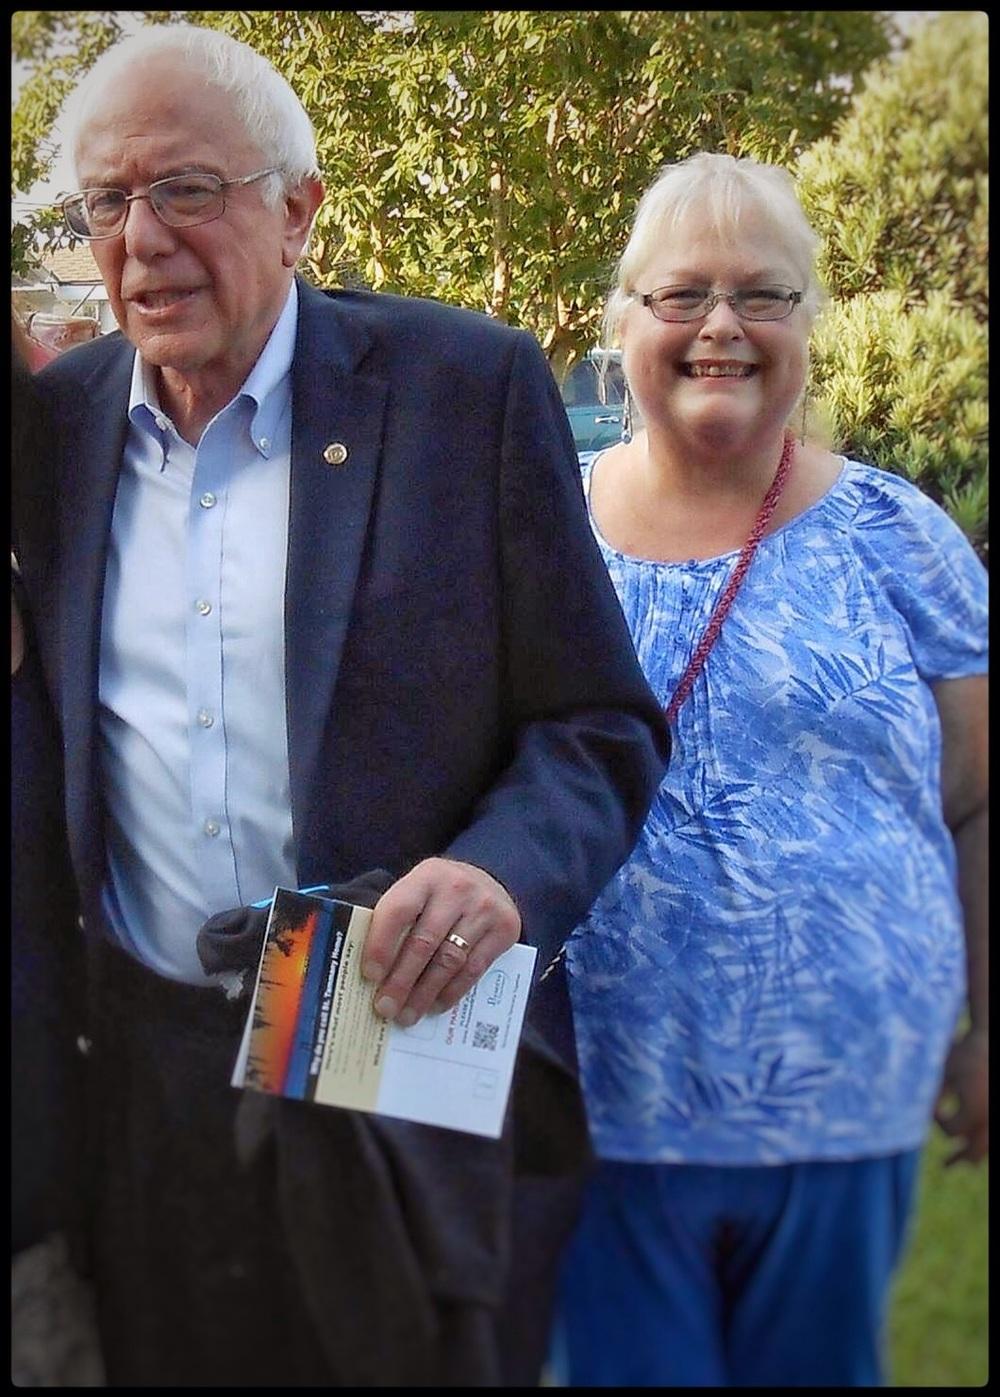 A Bernie Democrat in the wilds of Louisiana